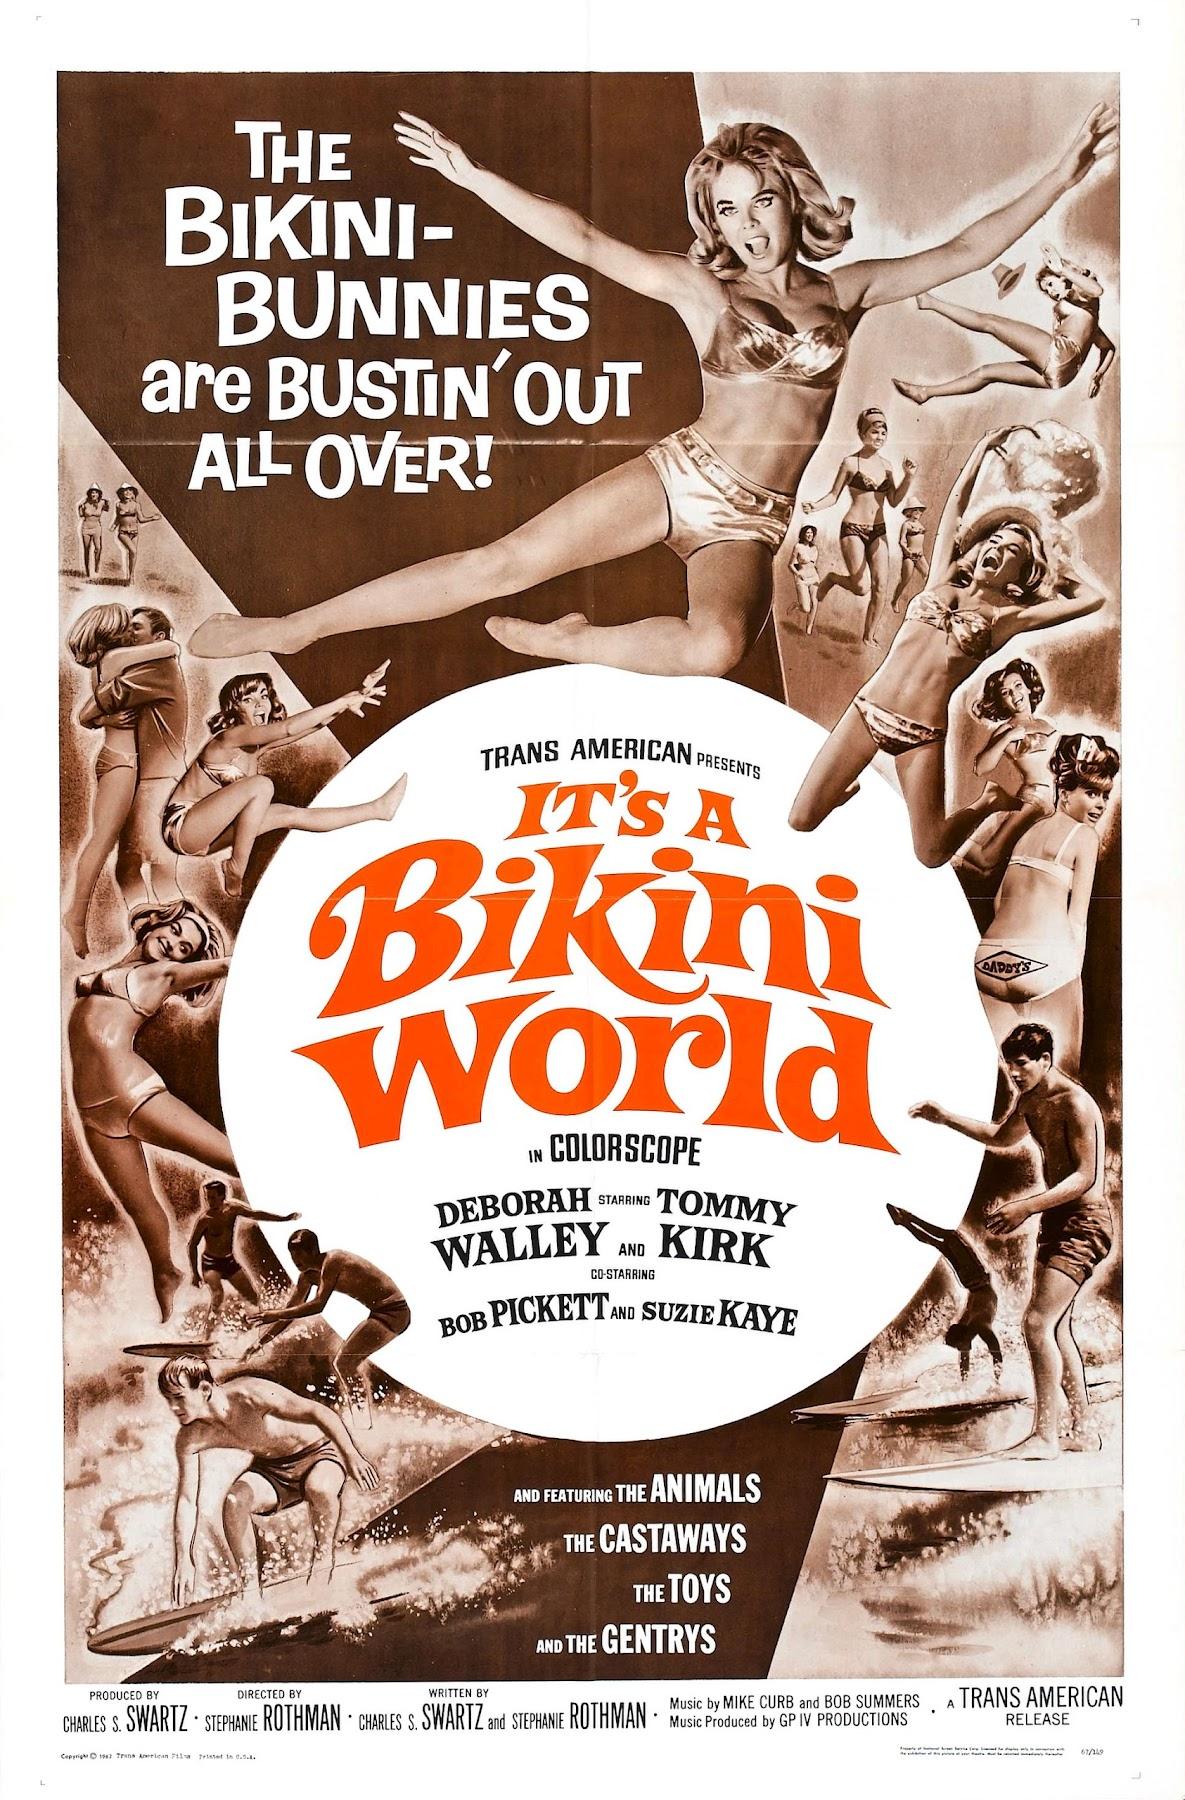 http://2.bp.blogspot.com/-1qwKOdDttcc/UDqHoRGAbaI/AAAAAAAAA0g/WoBcmI65uHw/s1800/its_a_bikini_world_poster_01.jpg